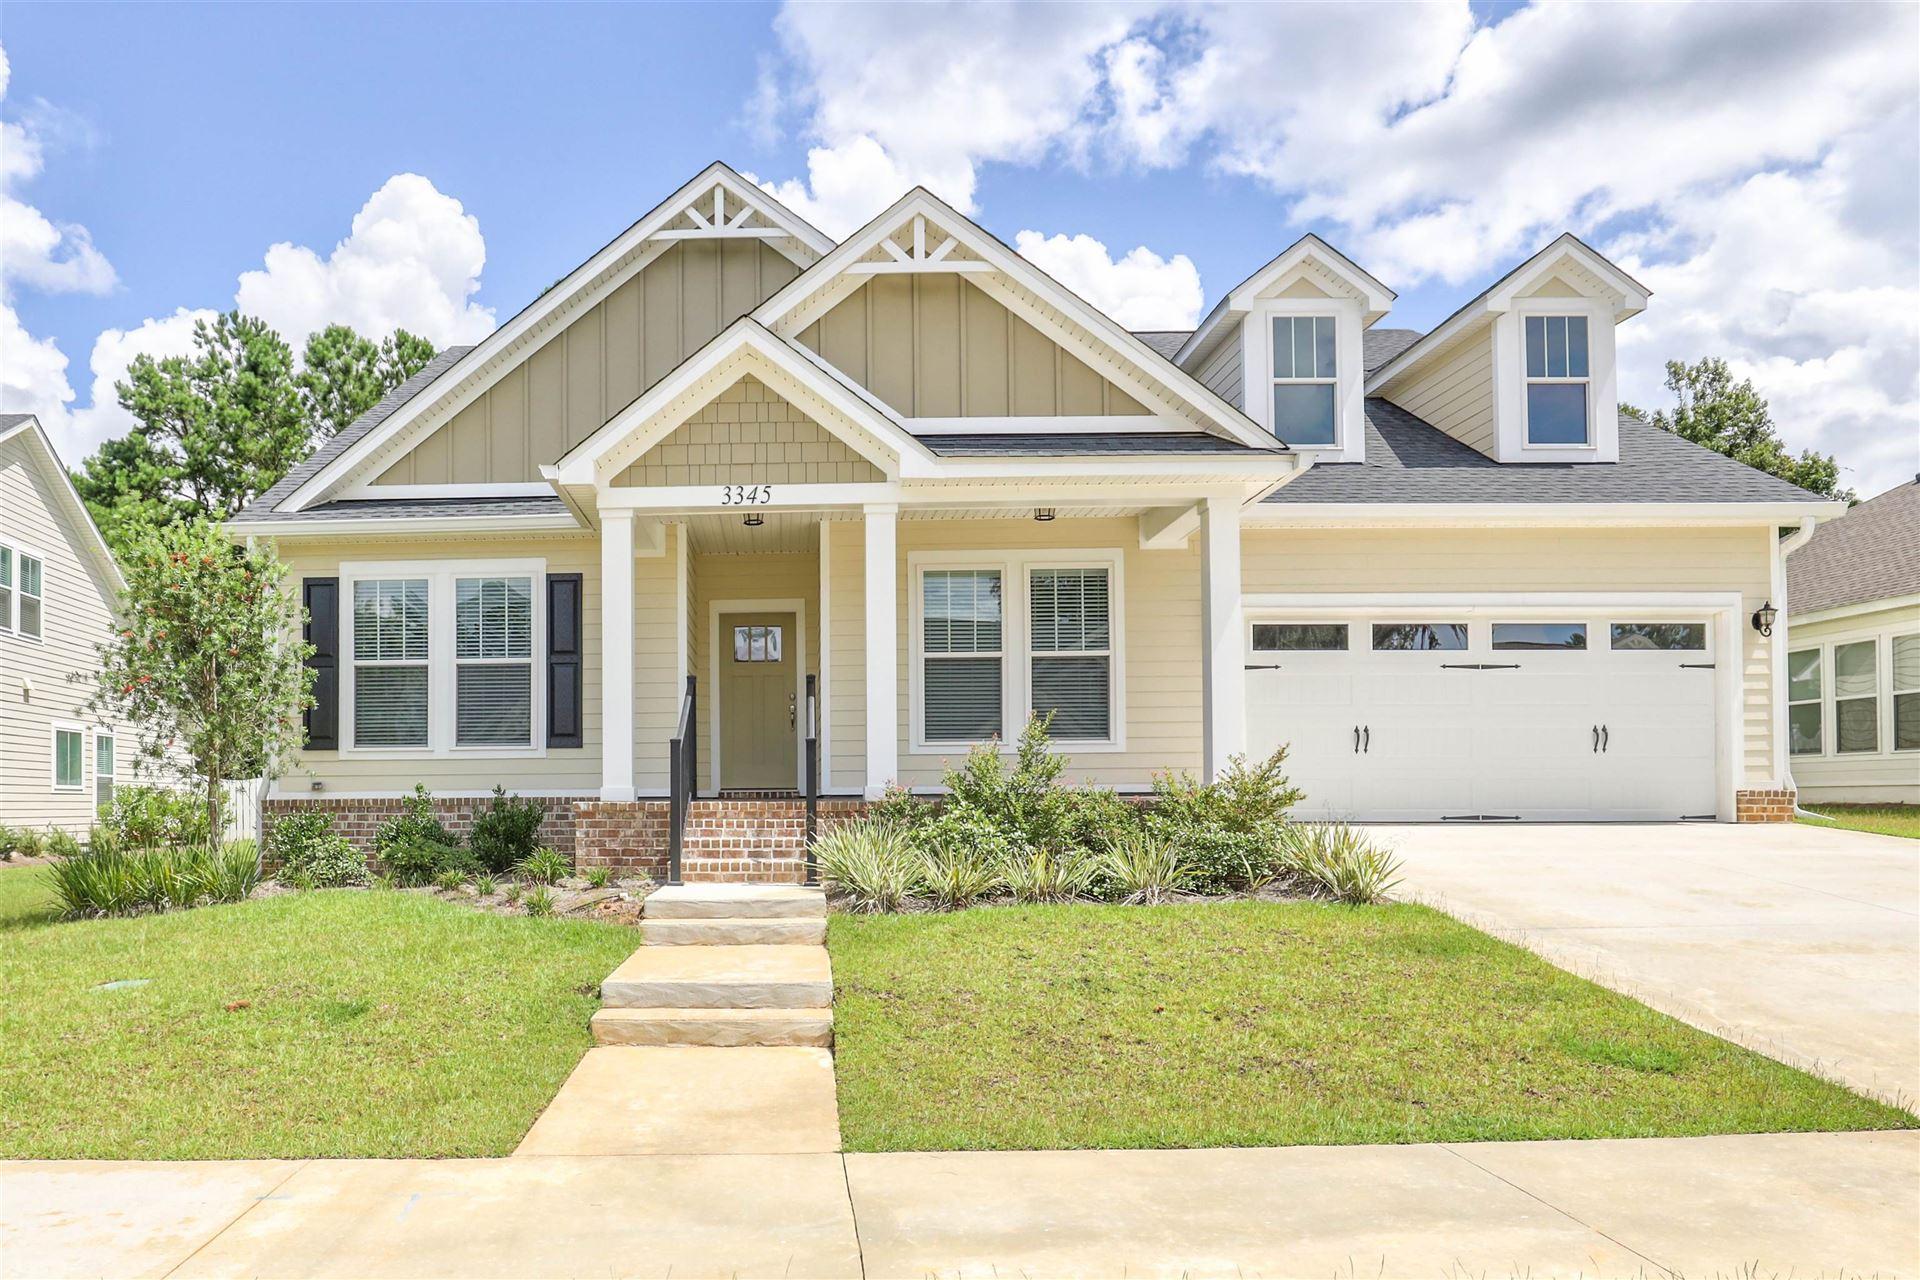 XX Mount Vernon Lane, Tallahassee, FL 32311 - MLS#: 337244